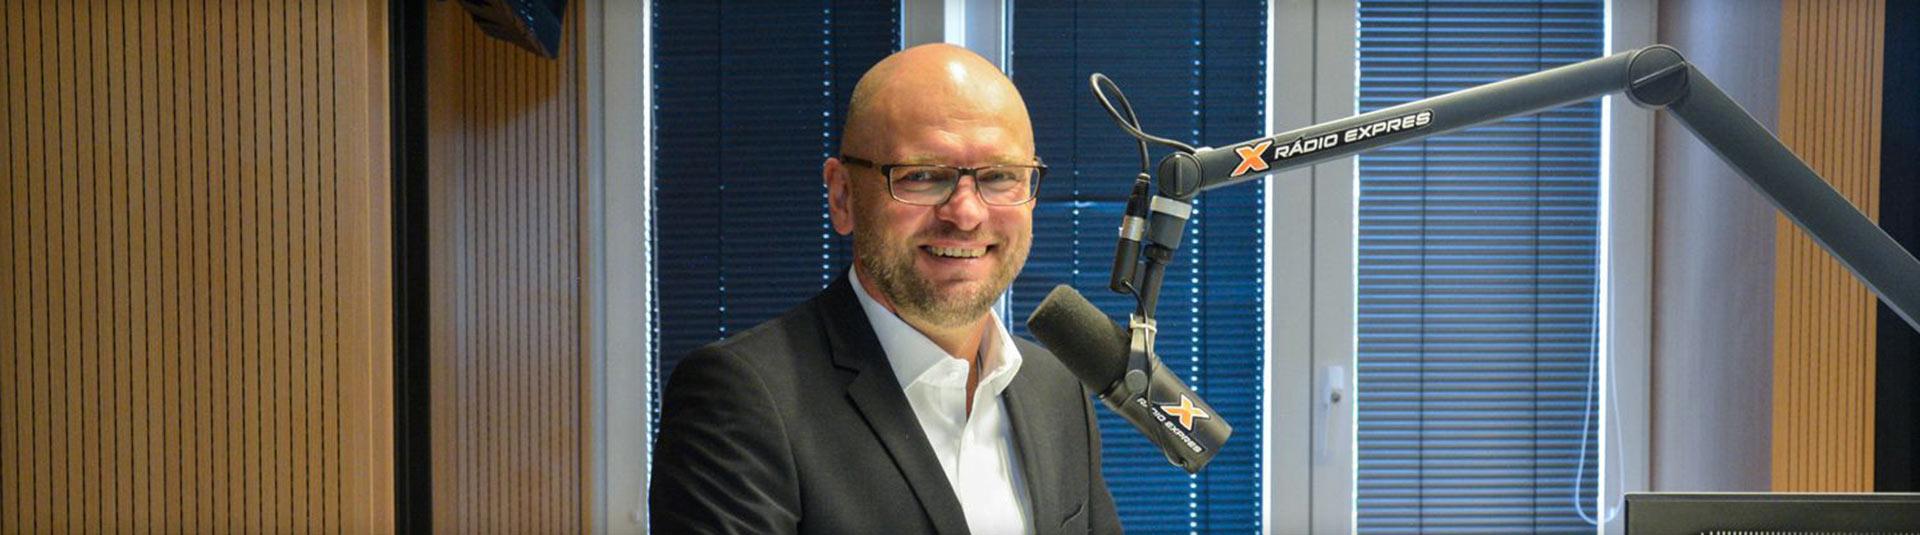 Richard Sulík v rádiu